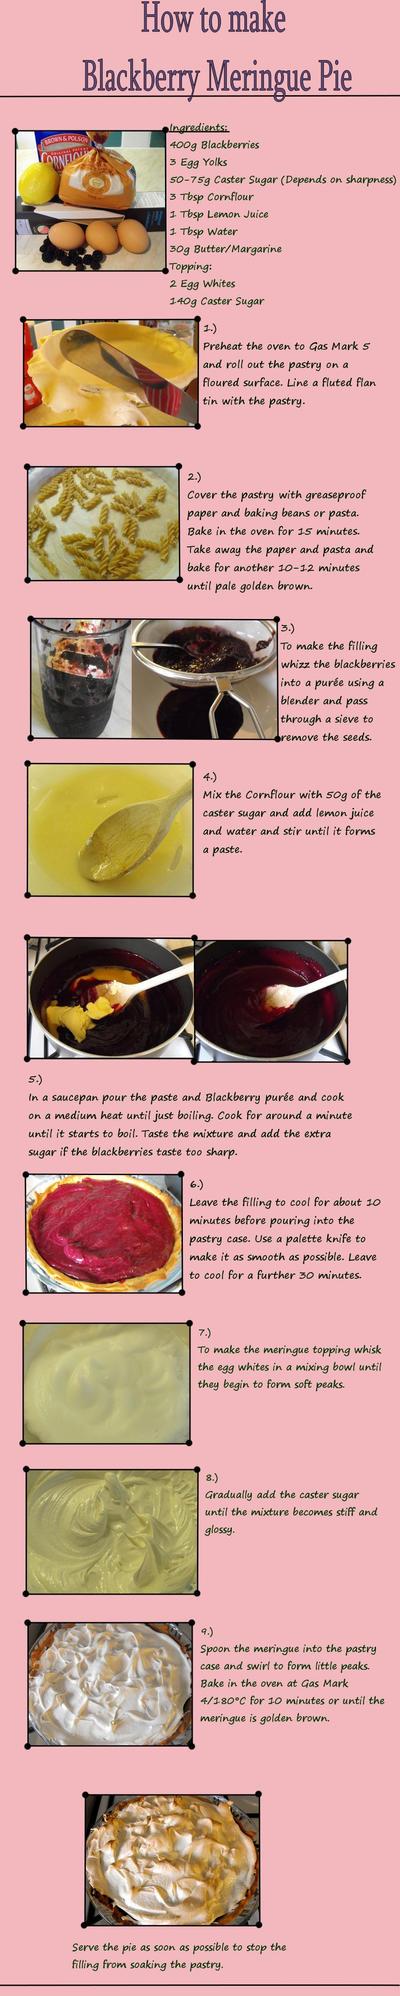 Blackberry Meringue Pie Tut by Charlotte-Holmes